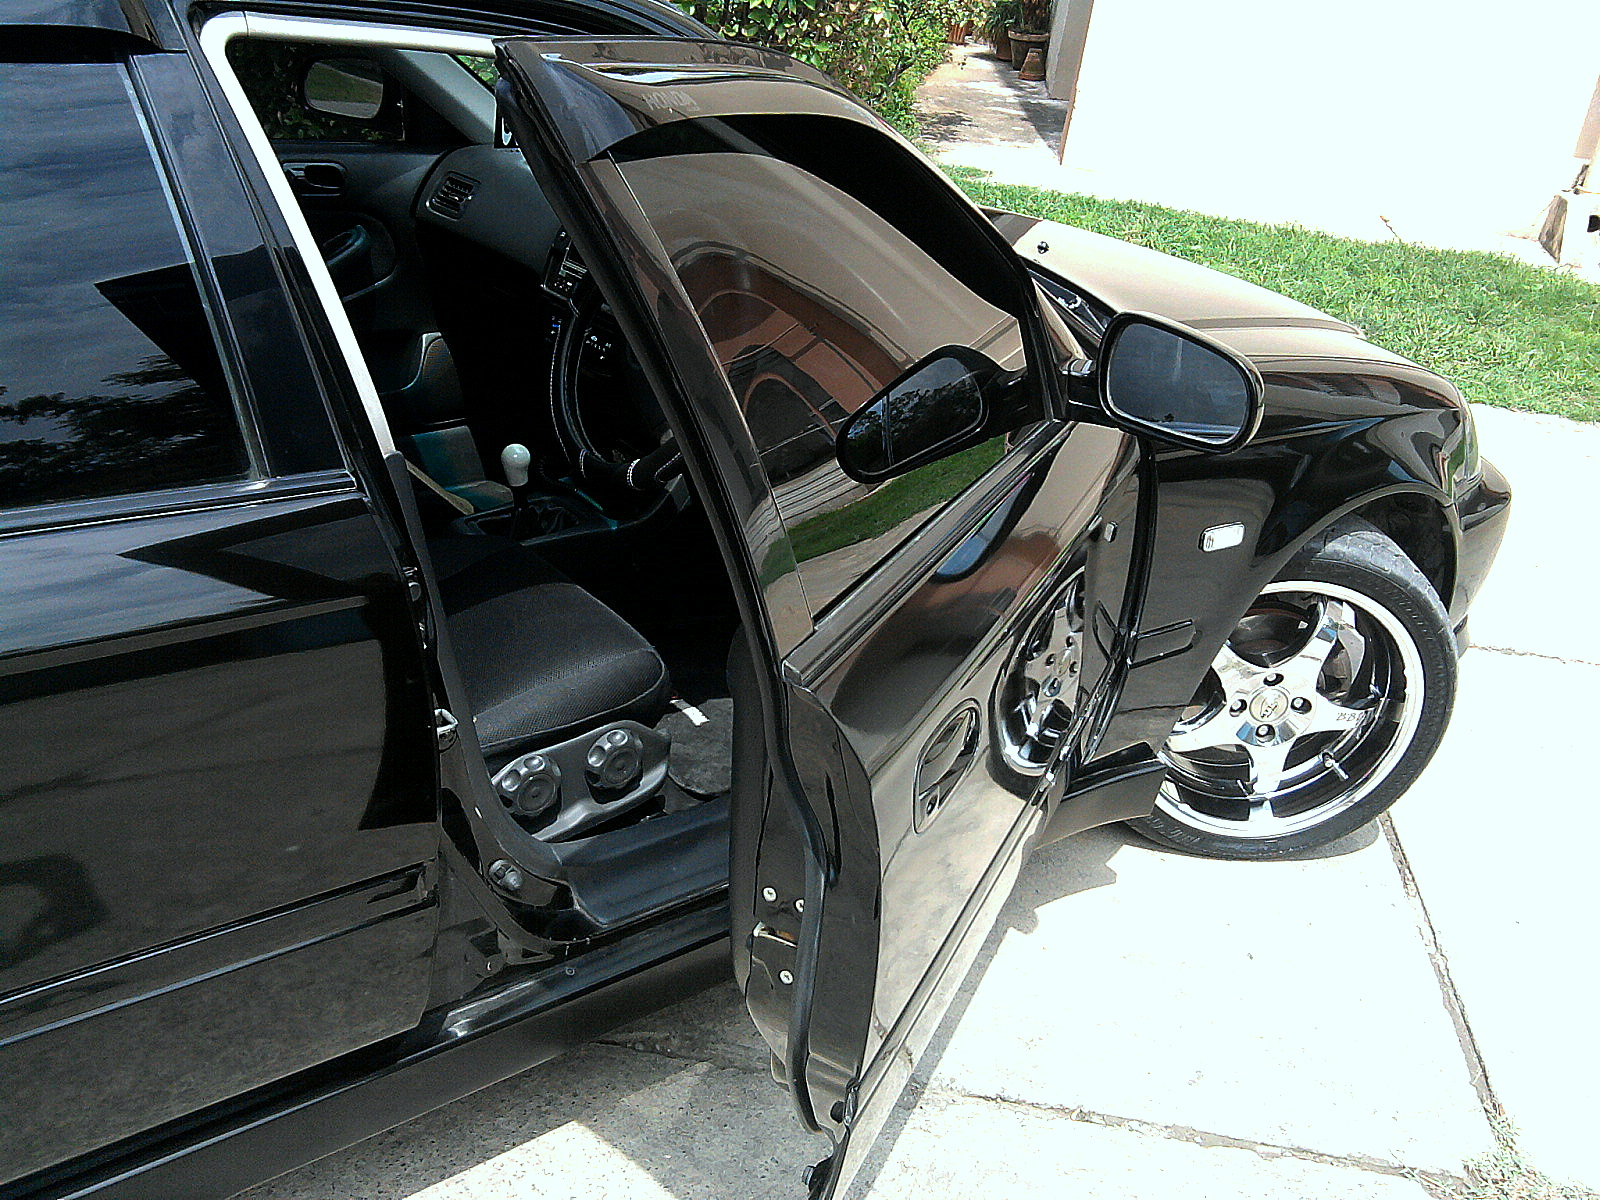 Honda Civic - 2000 black hawk Image-1